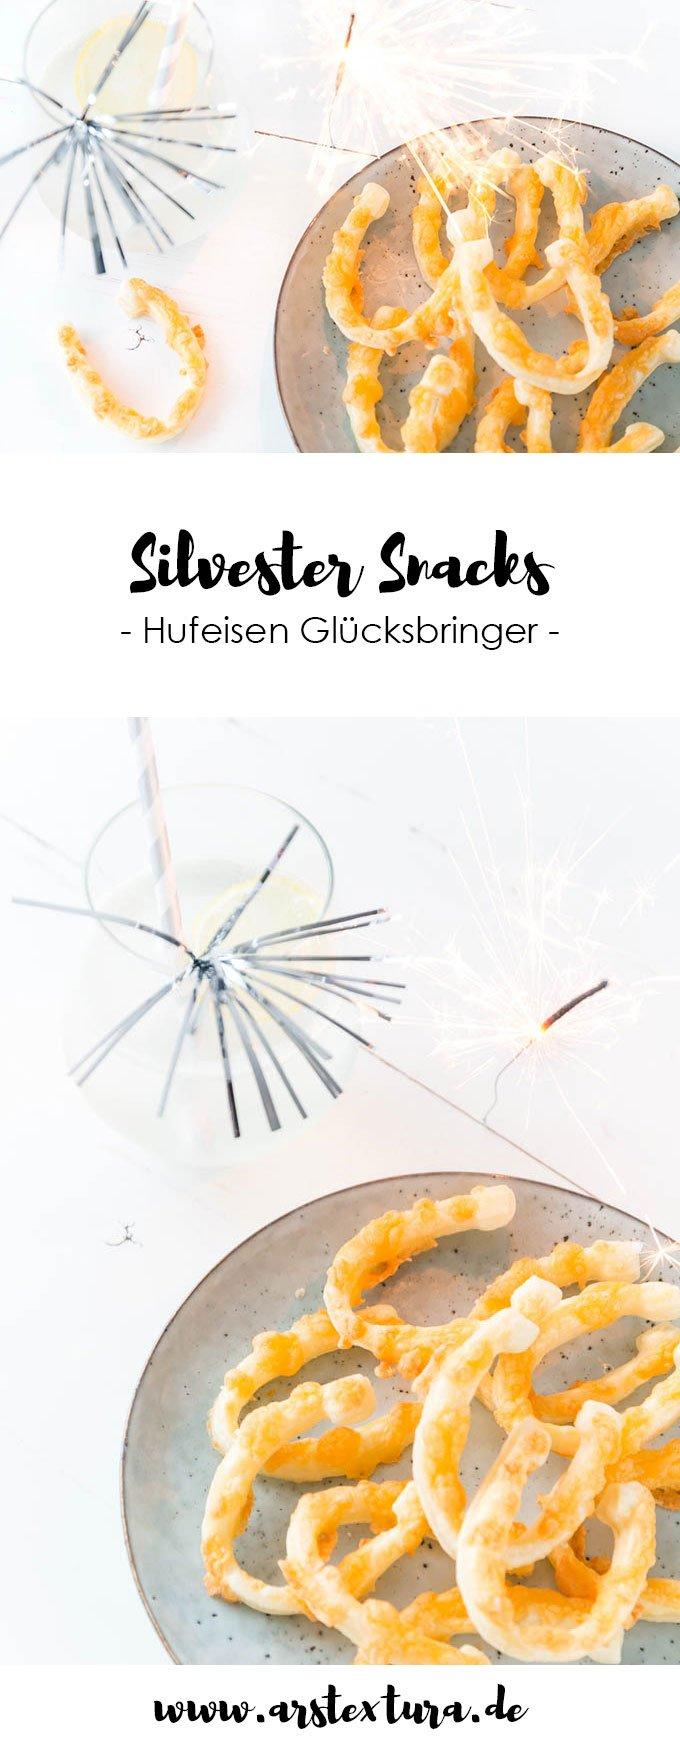 Silvester Rezept: Snacks - Hufeisen aus Blätterteig selber machen  | ars textura - DIY Blog